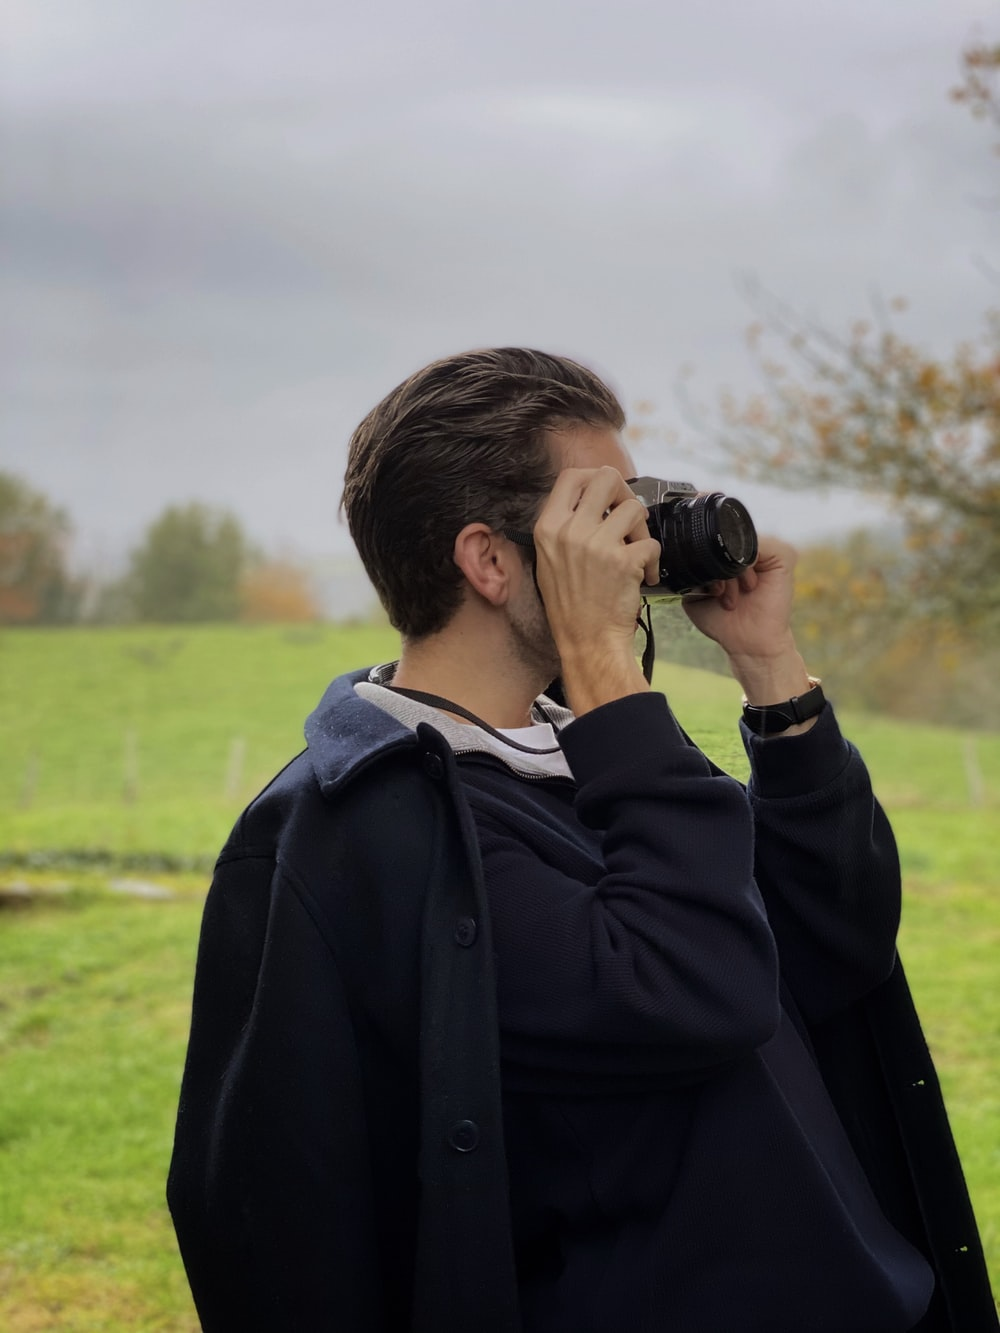 man in black jacket using binoculars